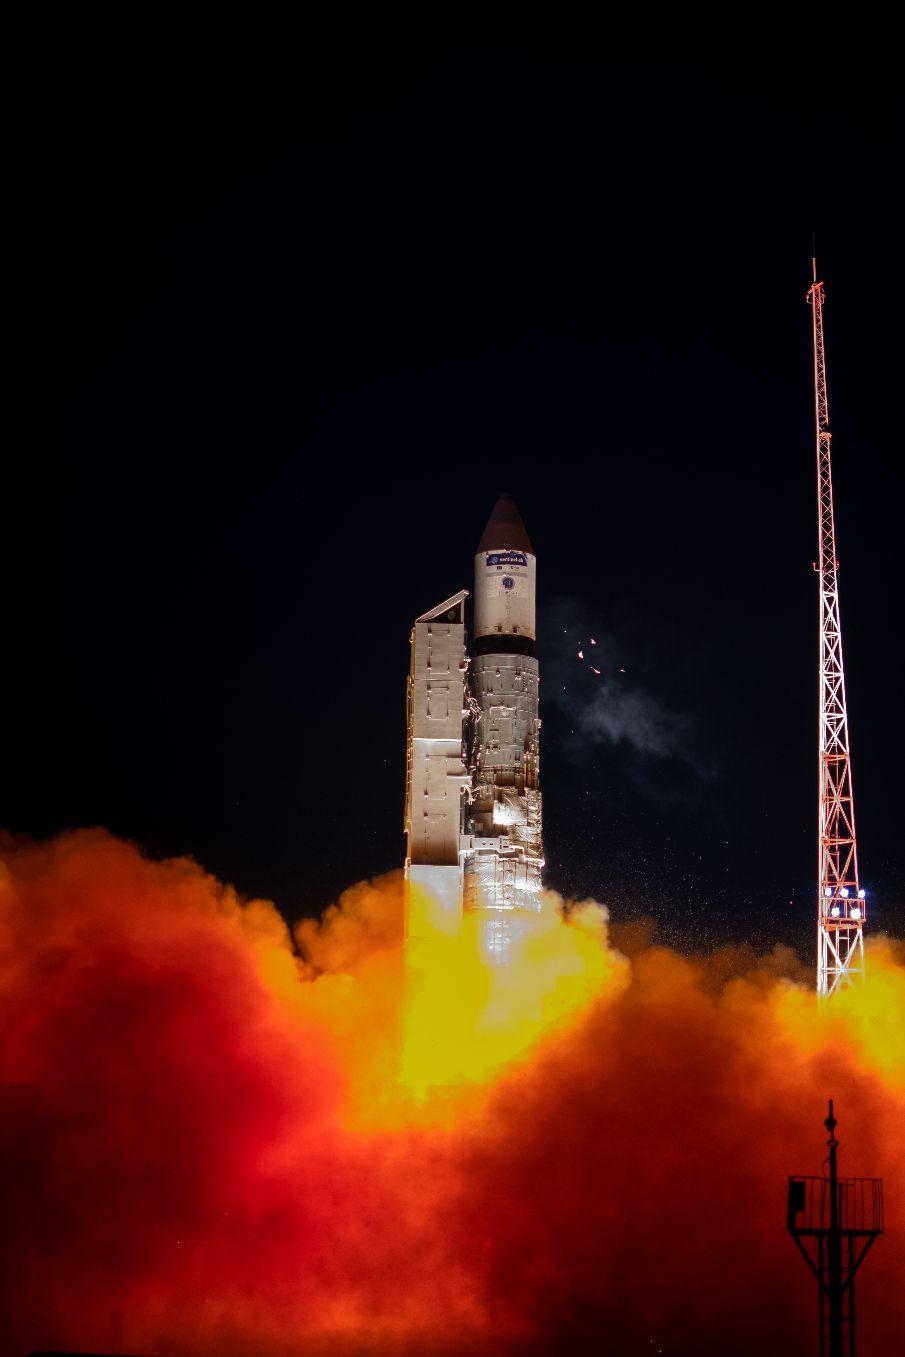 Un second Sentinel 3 sur orbite